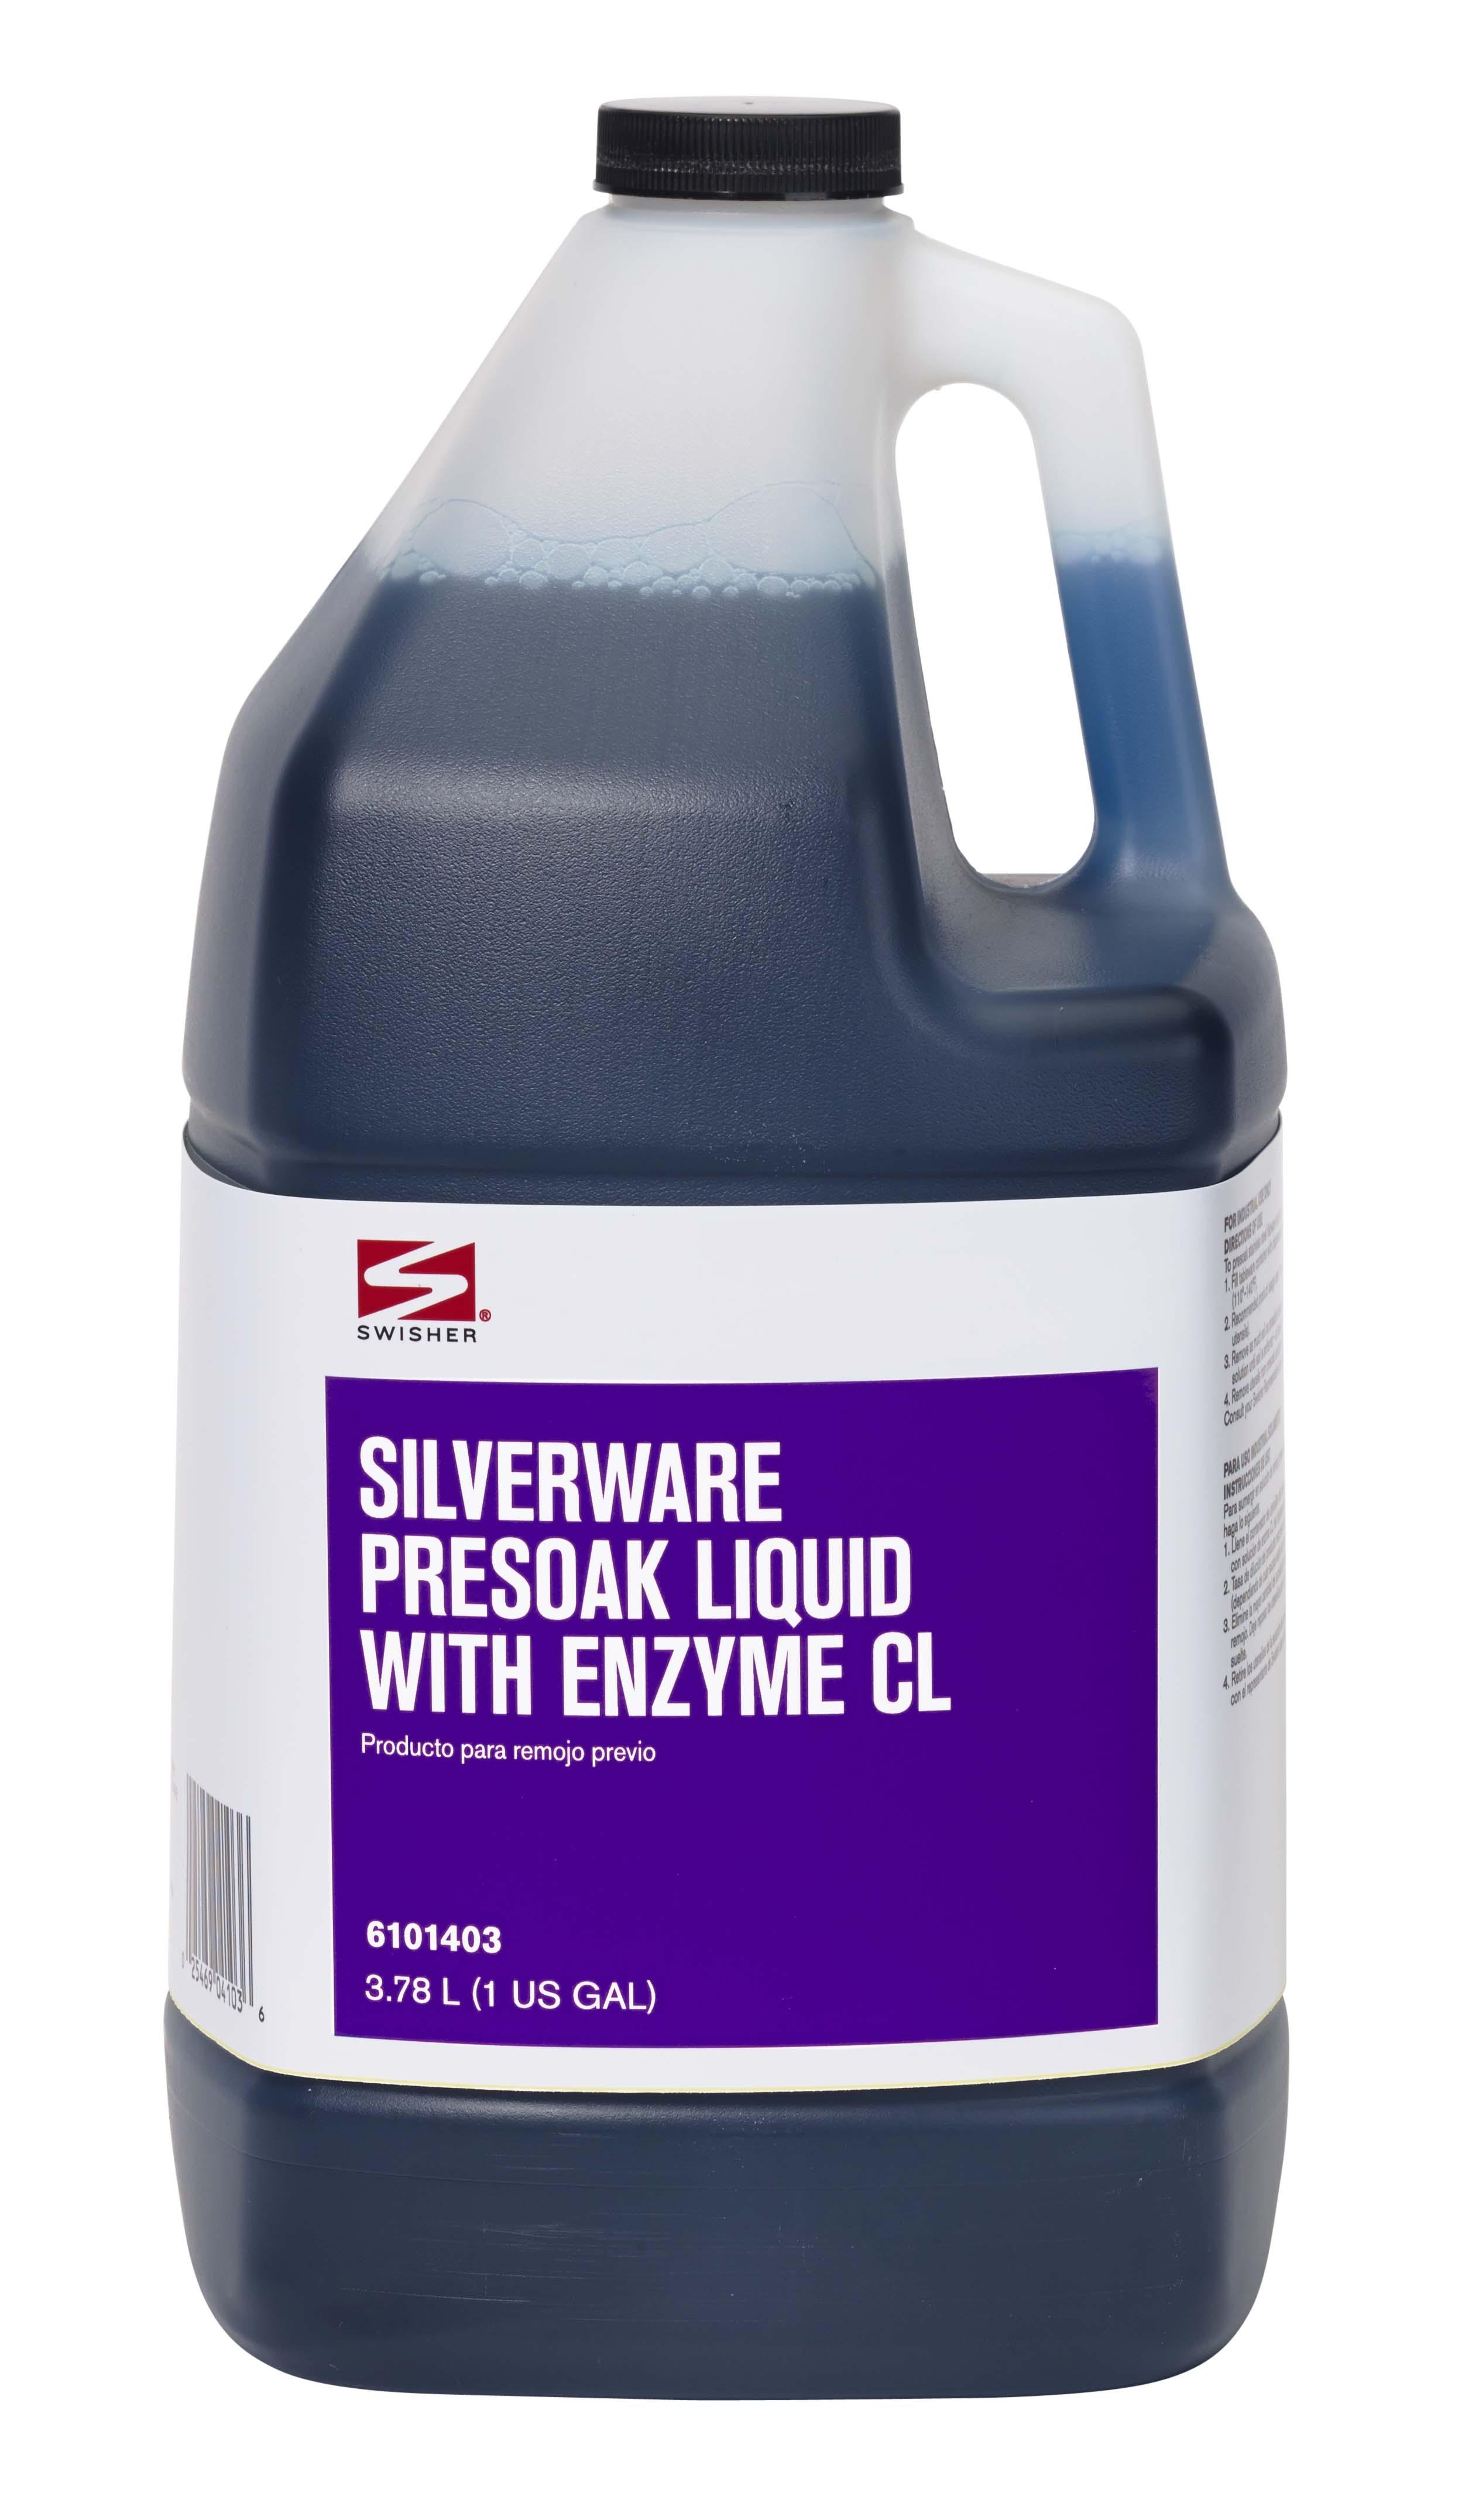 Swisher Silverware Presoak Liquid With Enzyme Cl